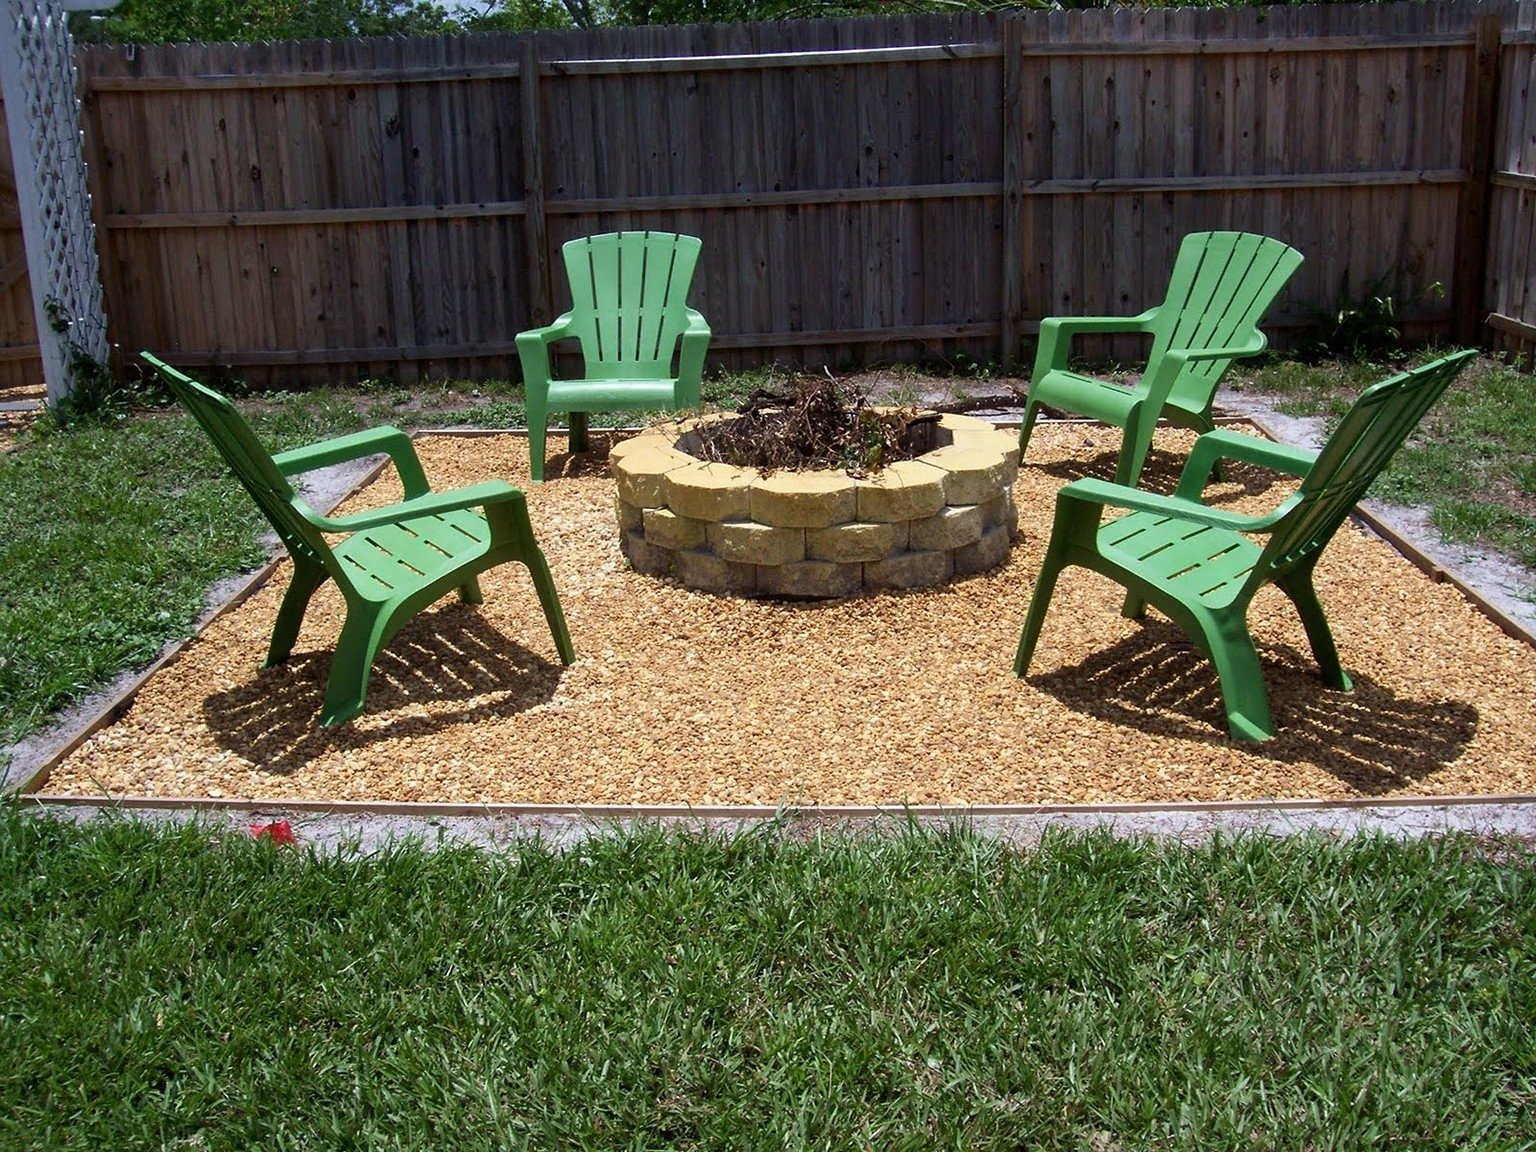 10 Beautiful Simple Backyard Fire Pit Ideas backyard fire pit ideas cheap 2021